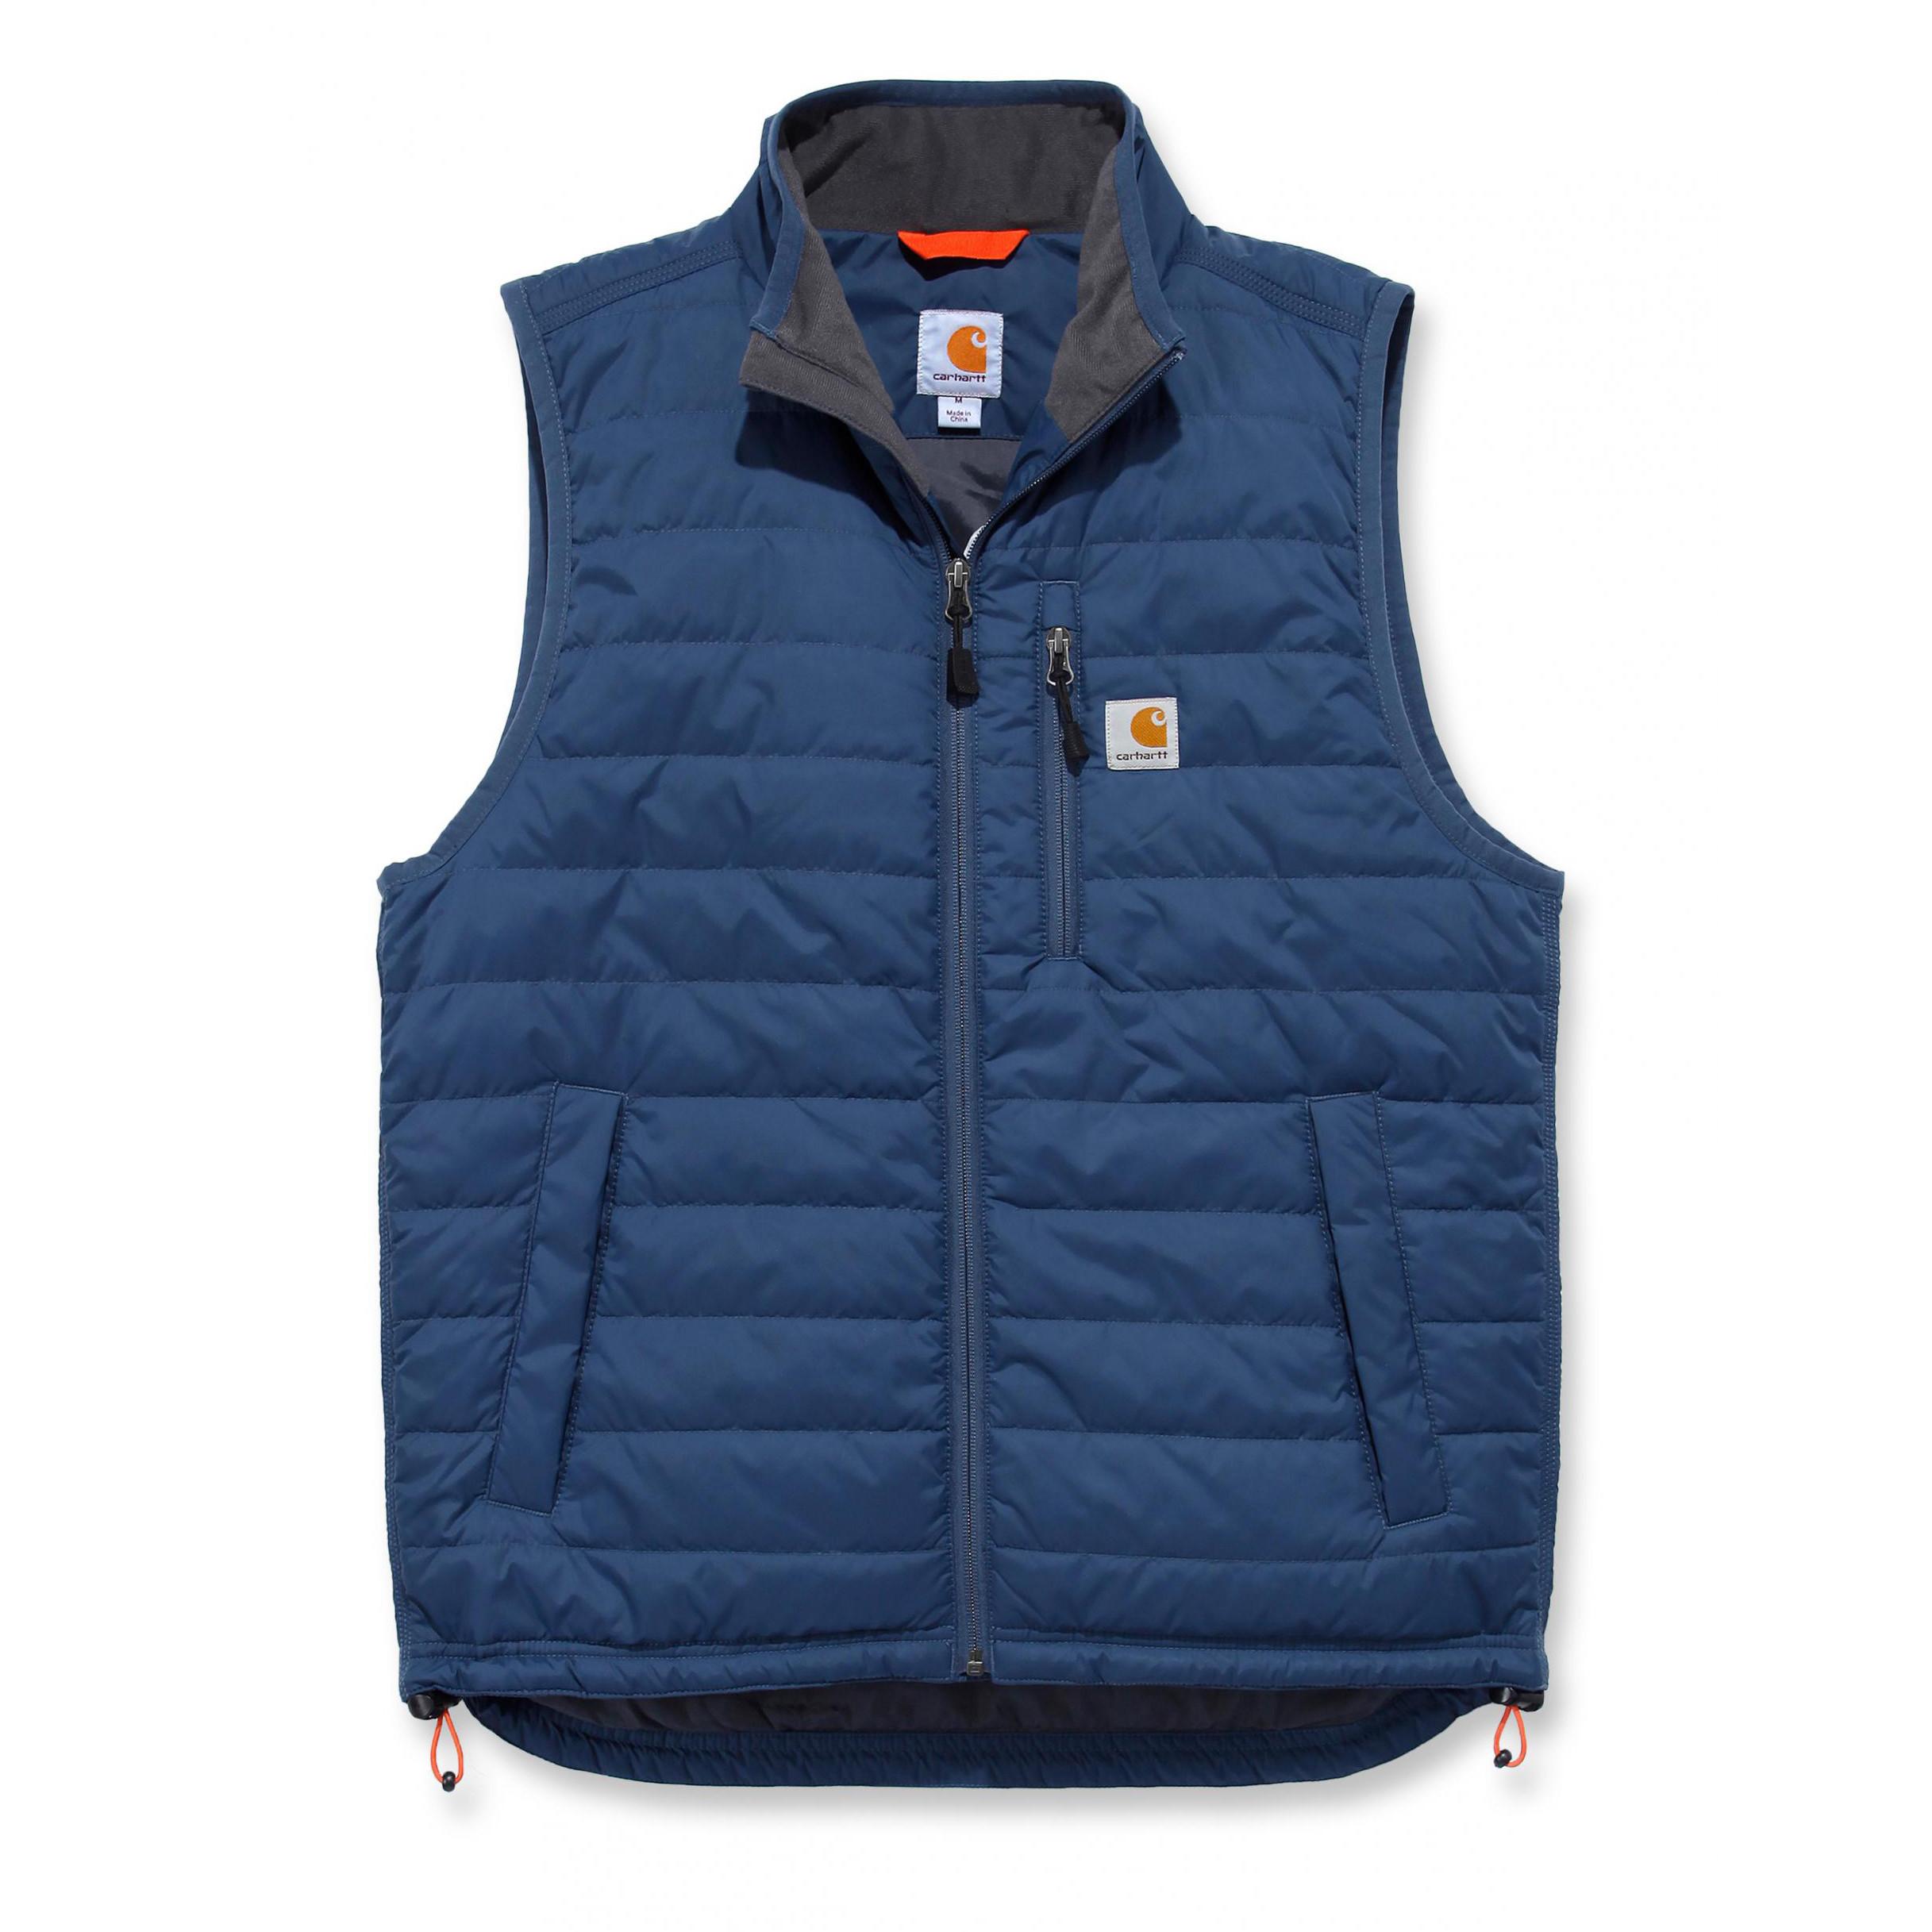 Жилет Carhartt Gilliam Vest - 102286 (Dark Blue, XL)